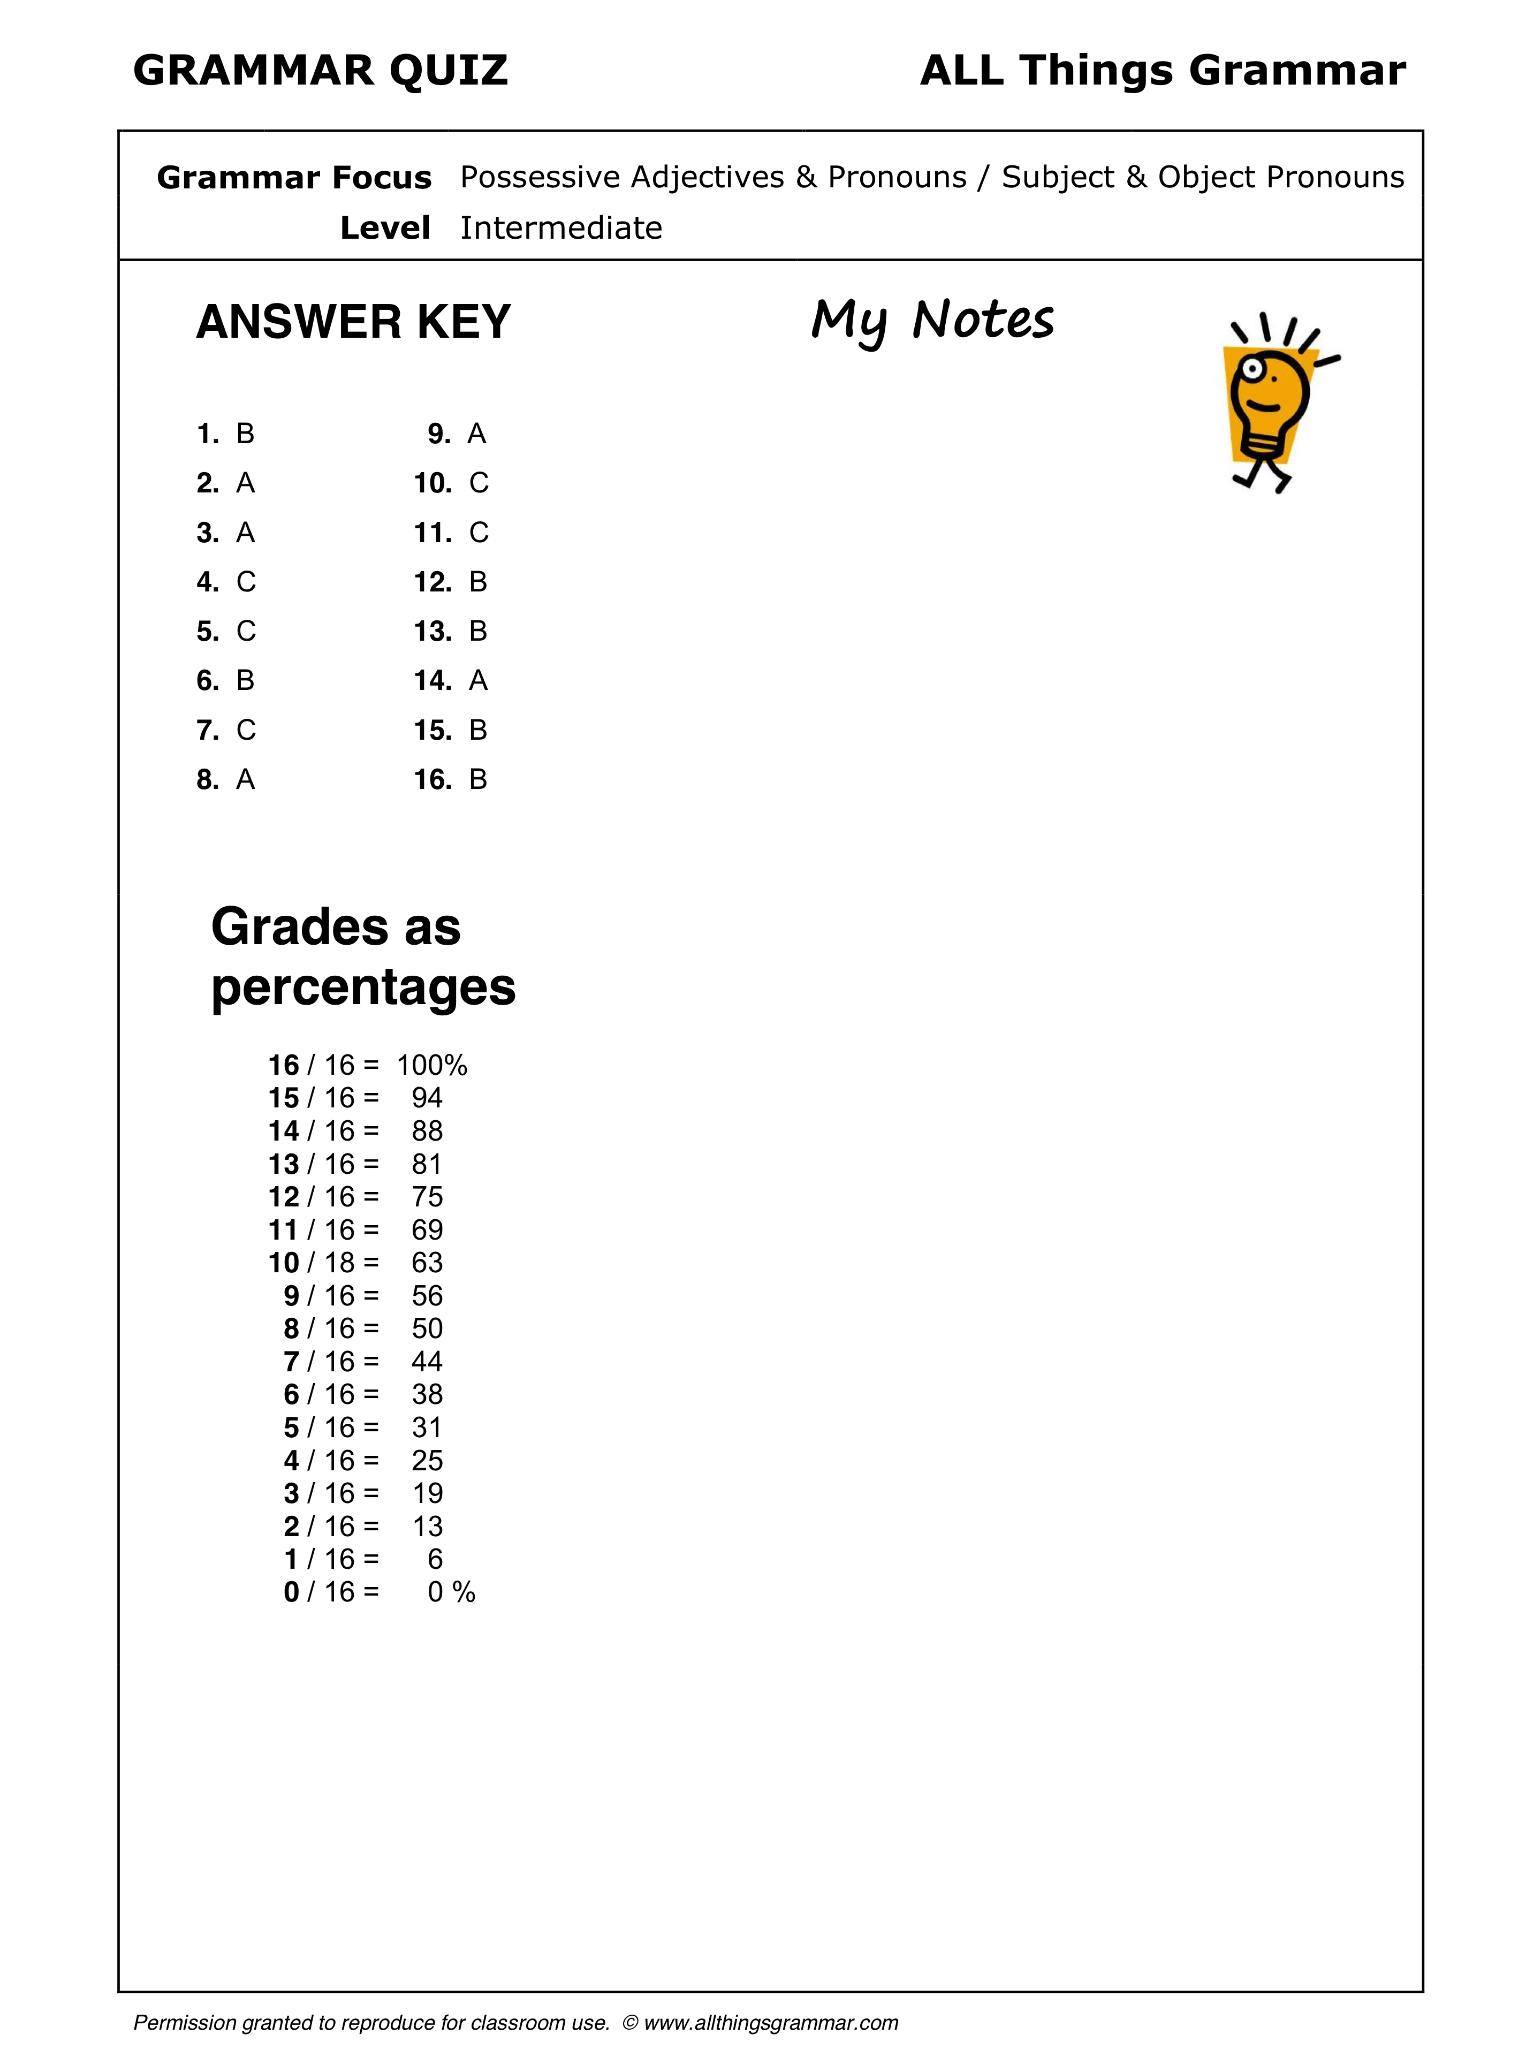 Possessive Adjectives Amp Pronouns Subject Amp Object